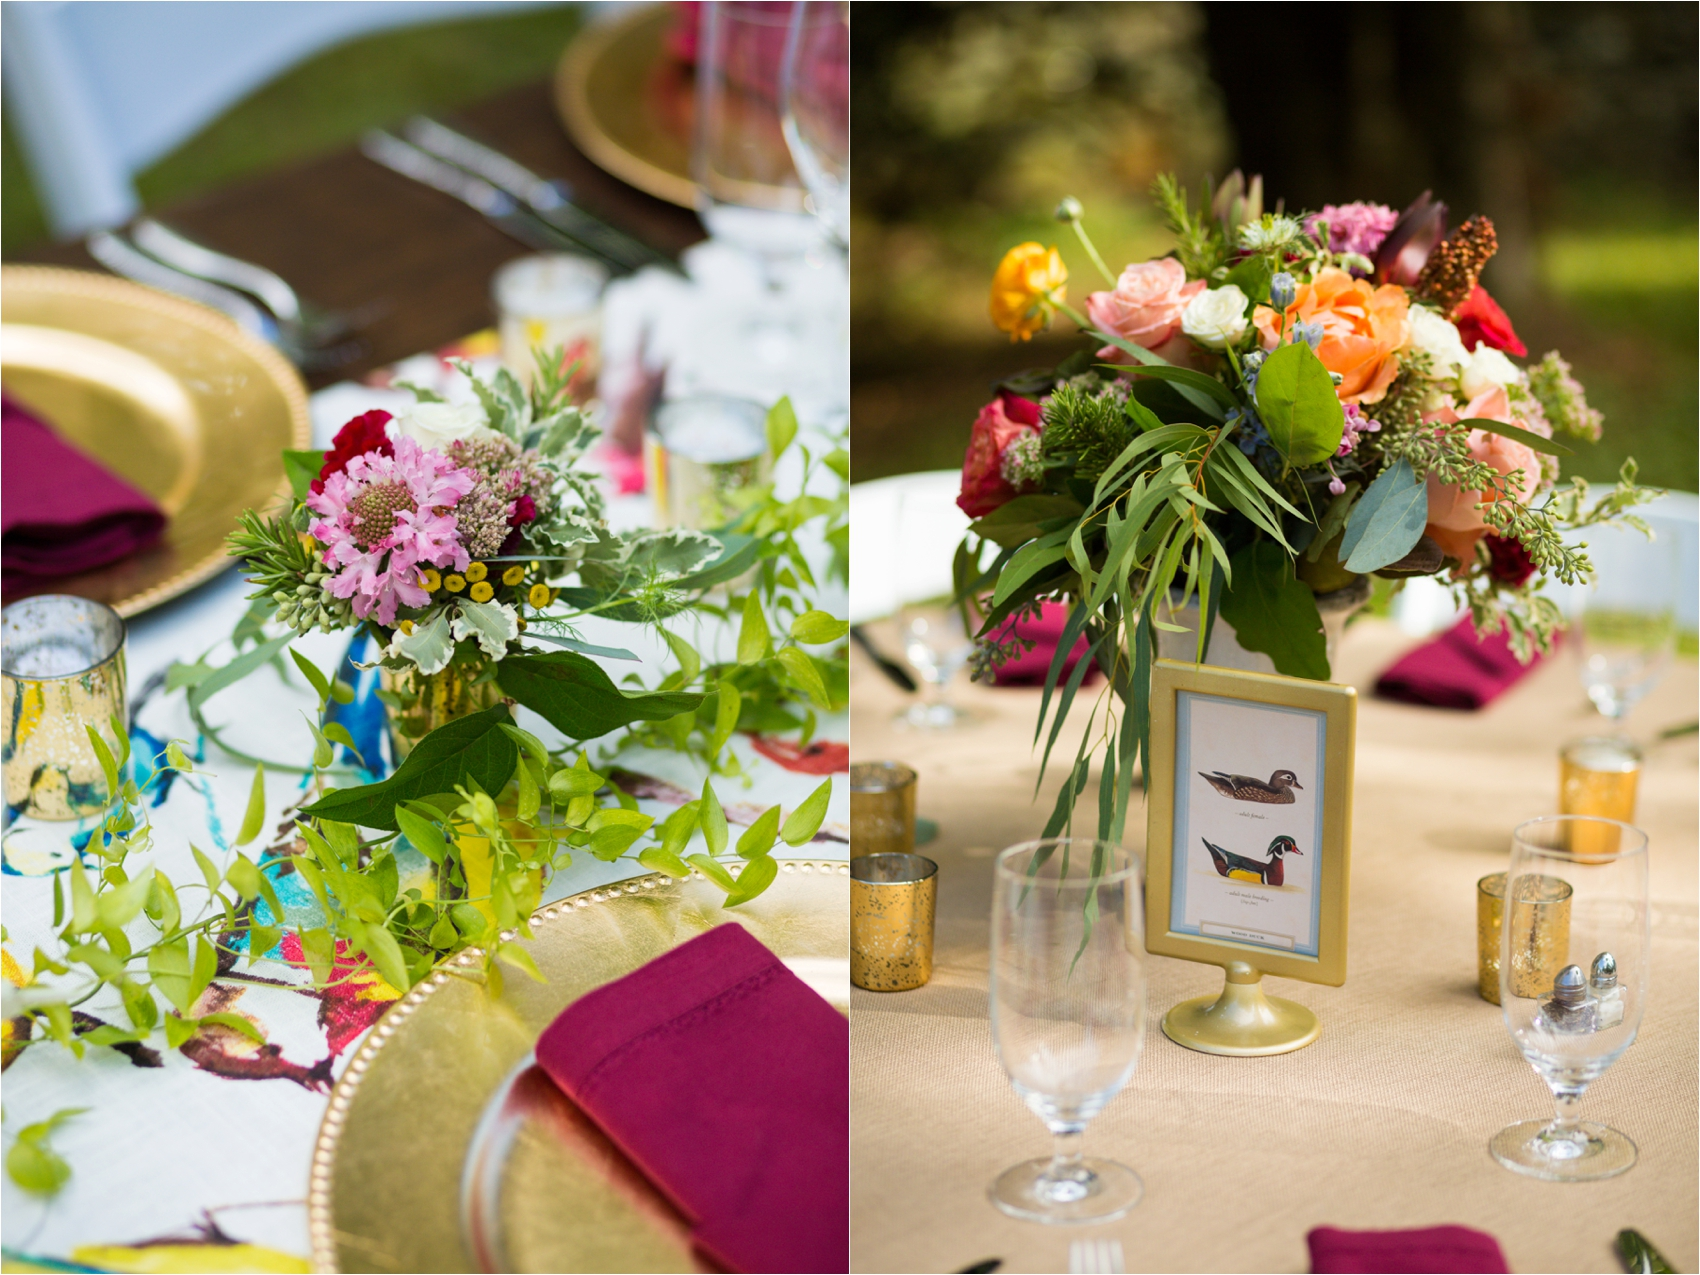 Feather-and-Oak-Rainforest-Trust-Virginia-Wedding-0348.jpg